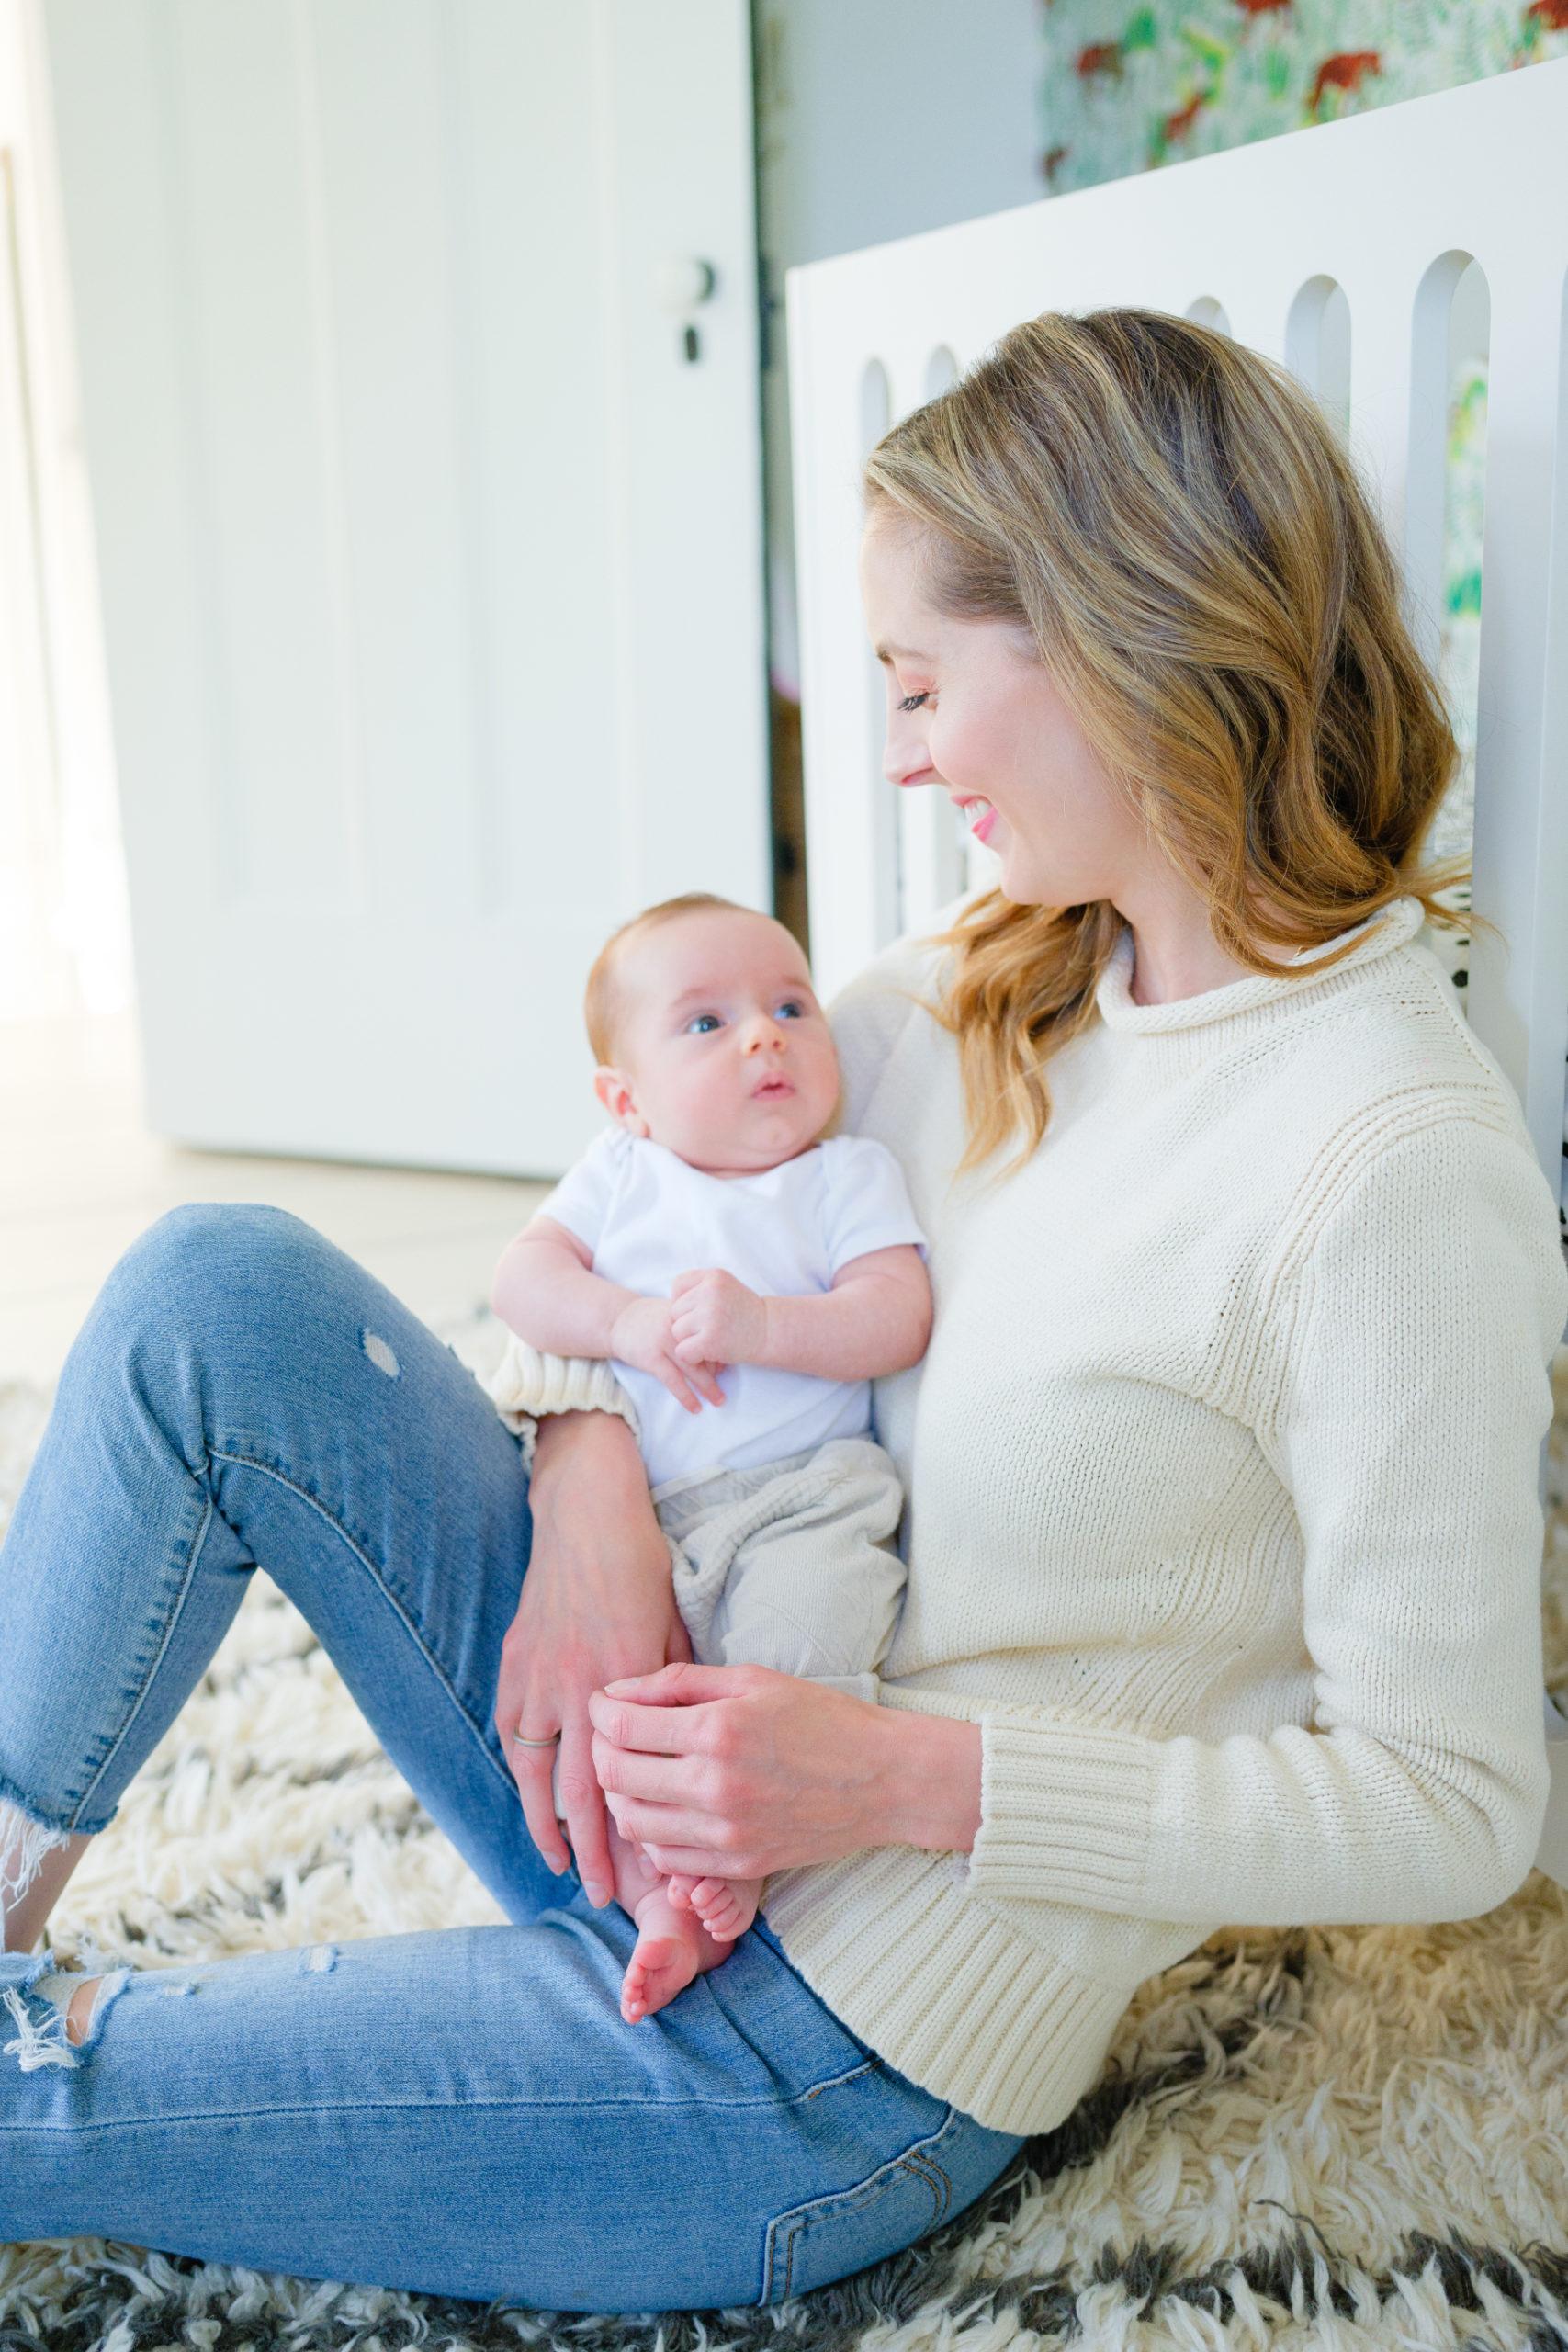 Eva Amurri shares her son Mateo's nursery update